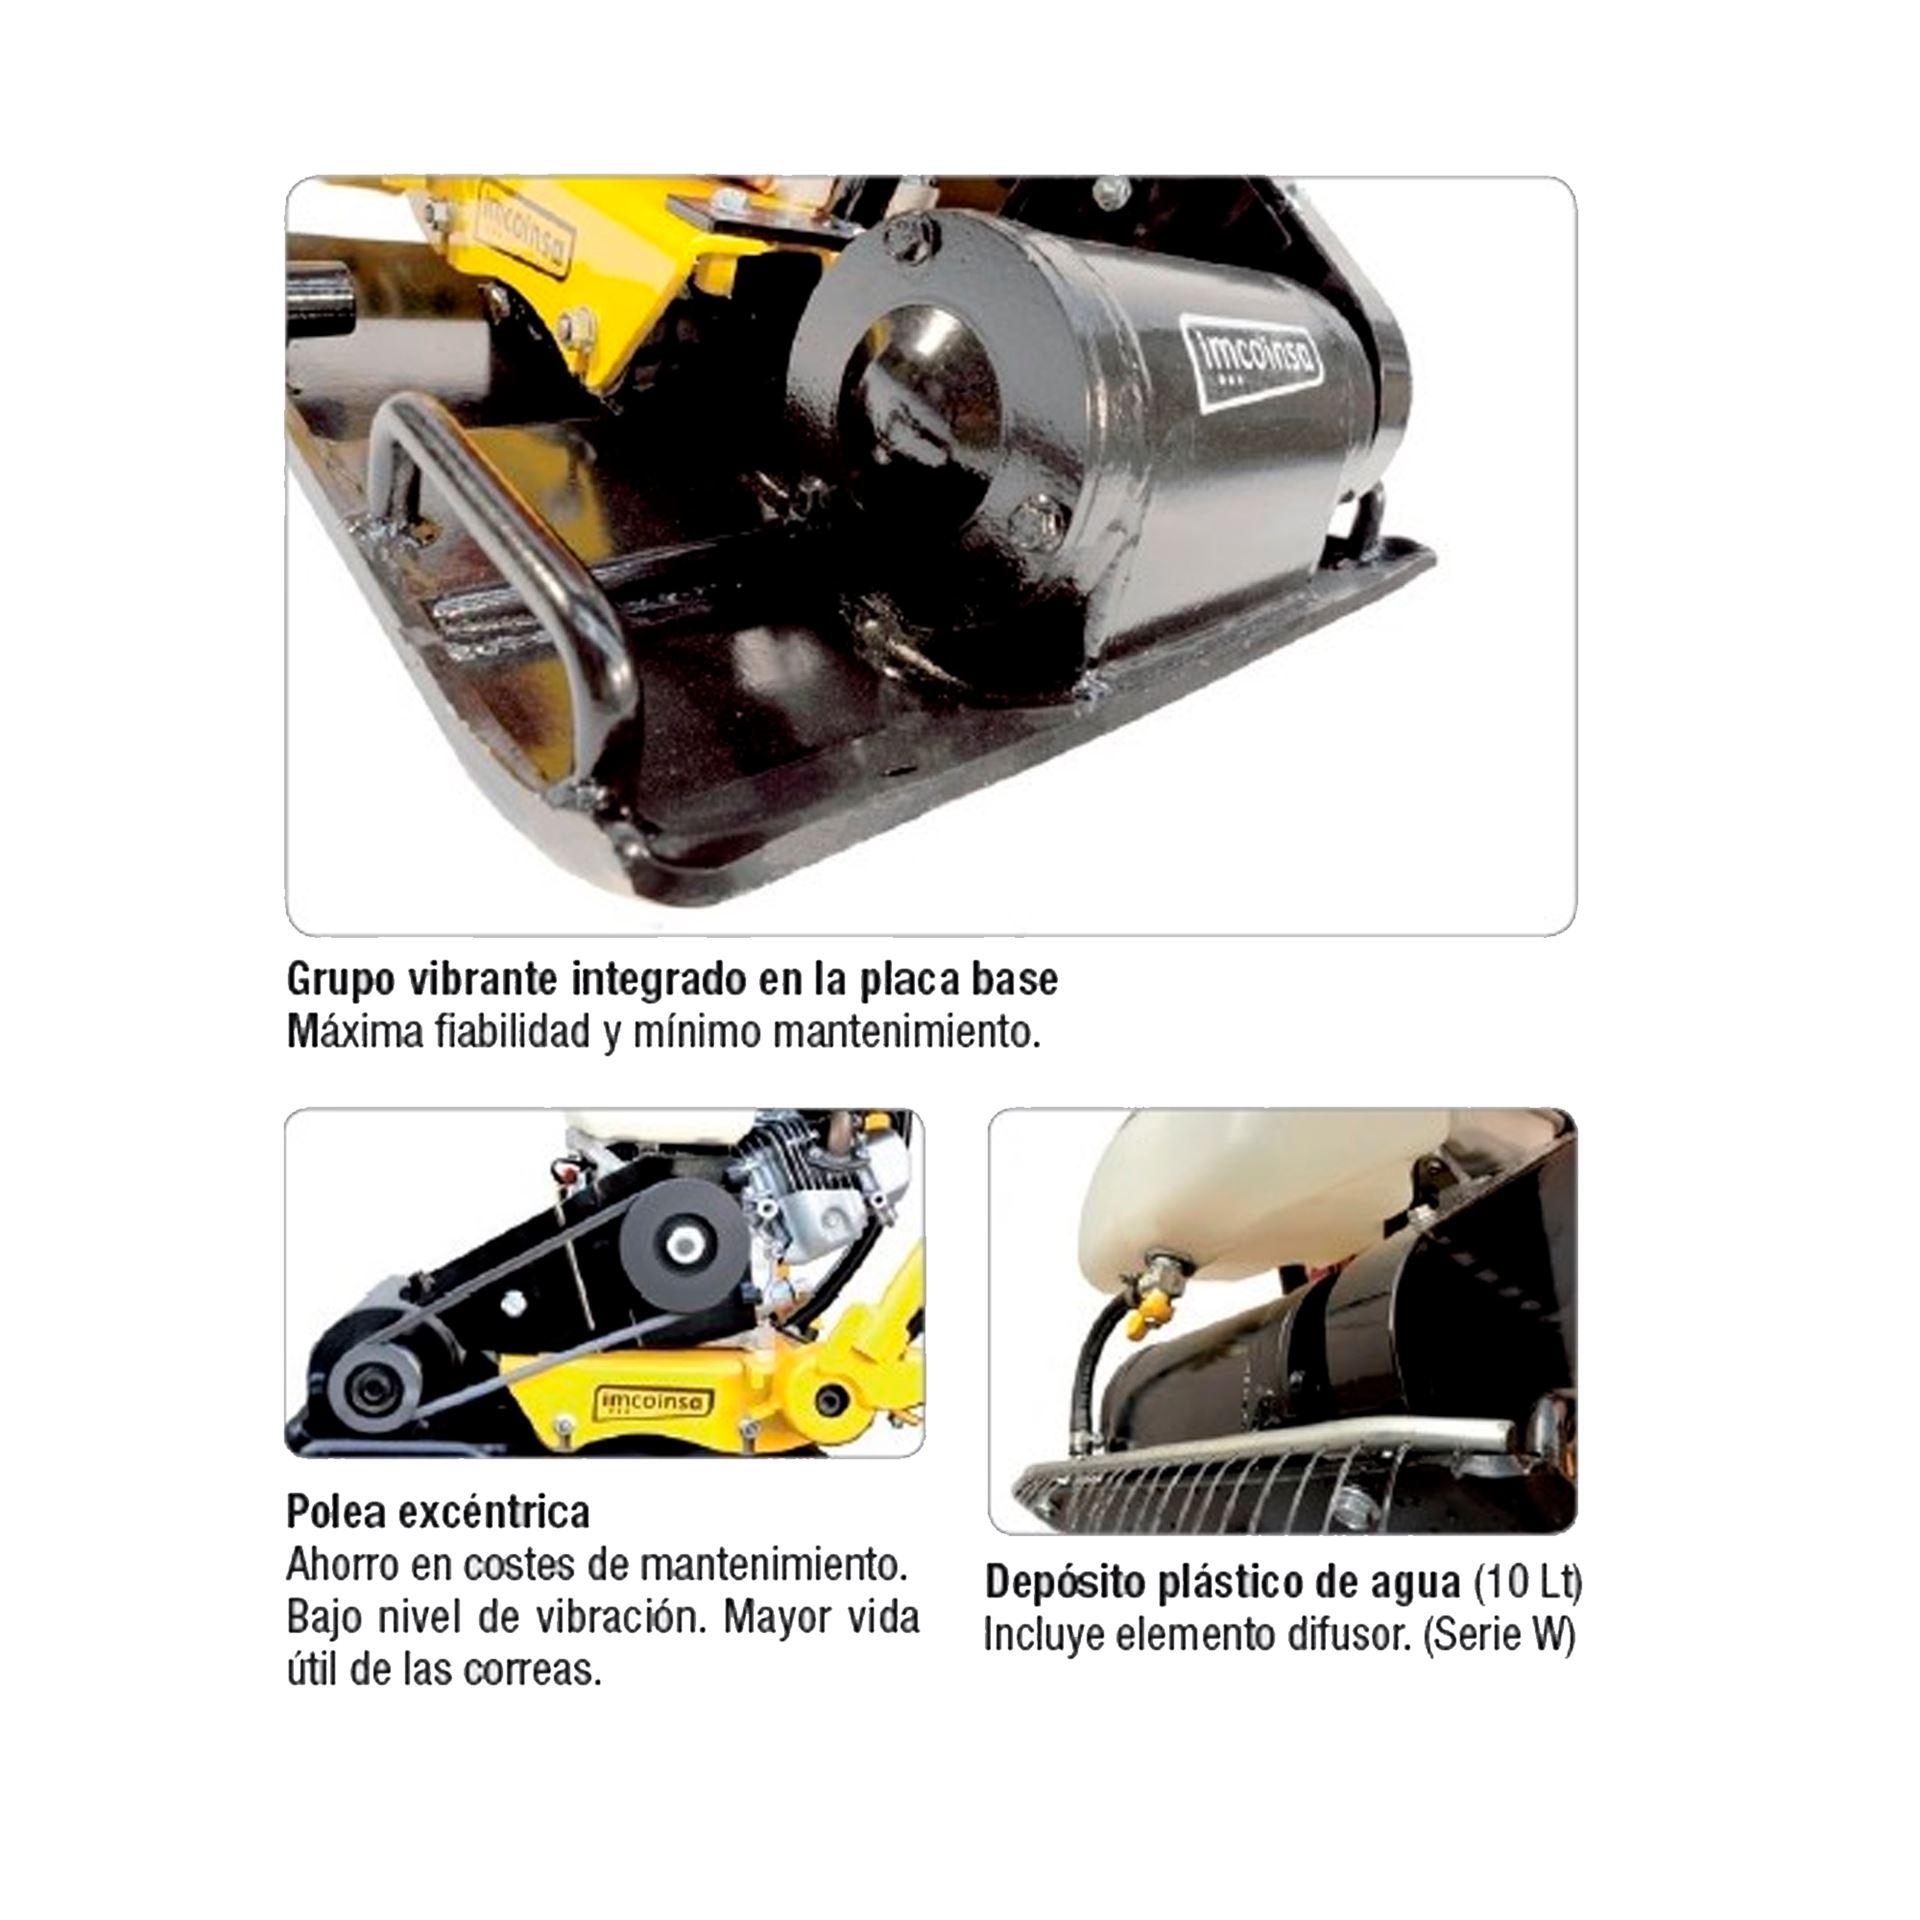 Imagen de Bandeja vibrante Imcoinsa 2I113W motor Honda